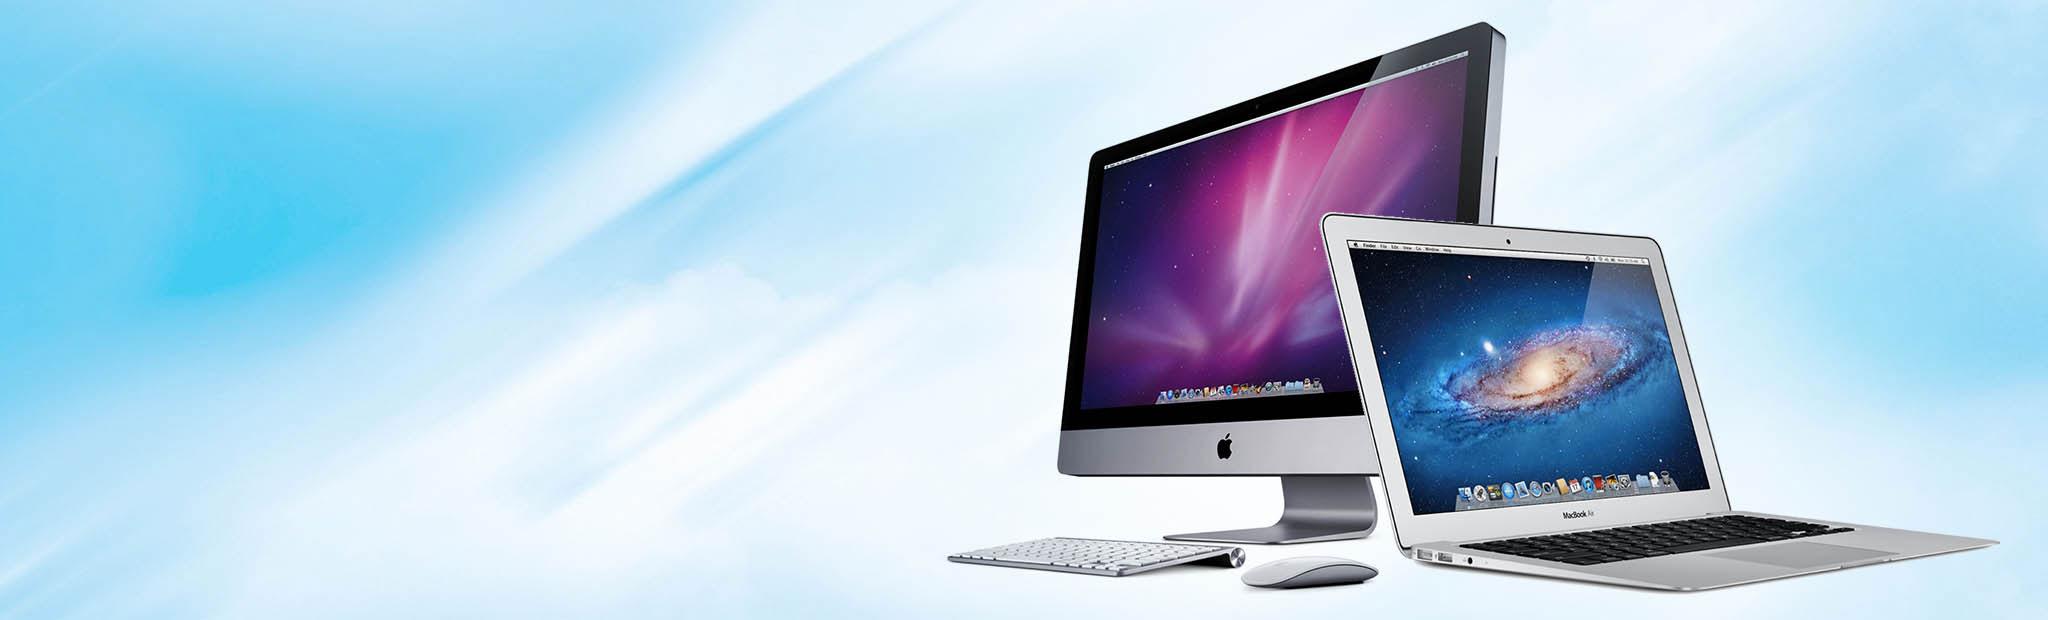 Recovery System Recupero Dati Mac